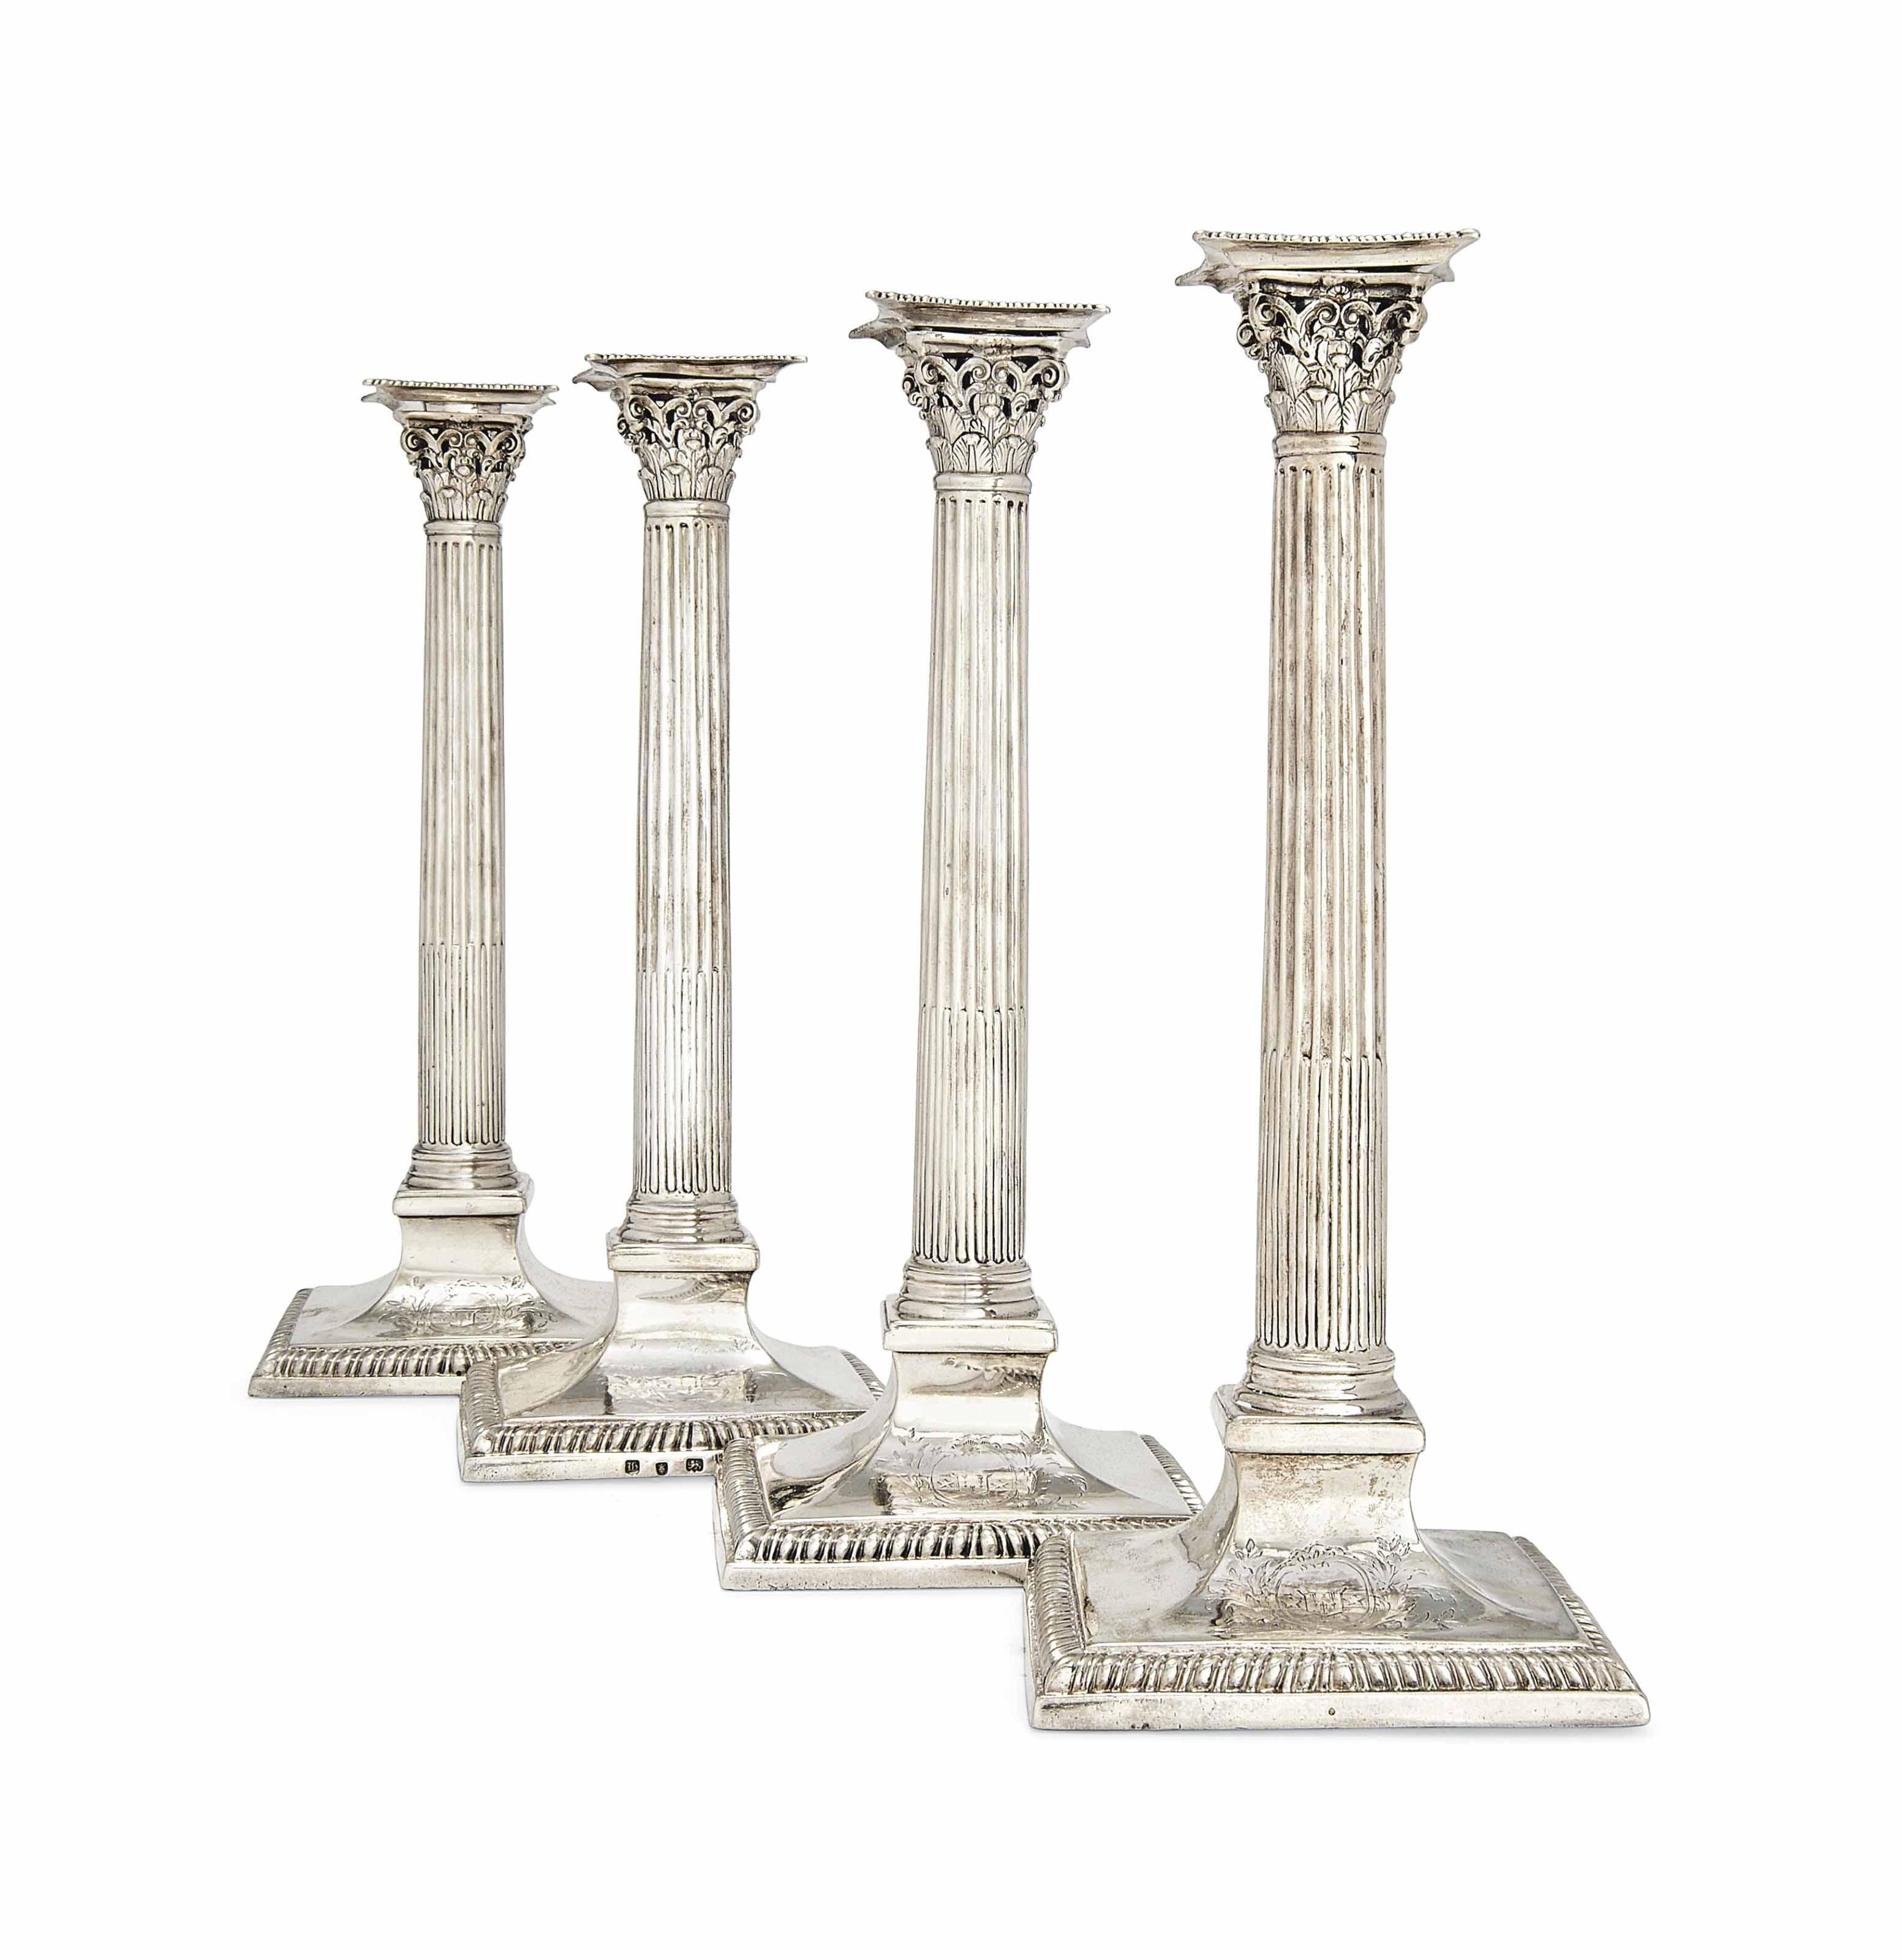 A SET OF FOUR GEORGE III SILVER CORINTHIAN COLUMN CANDLESTICKS